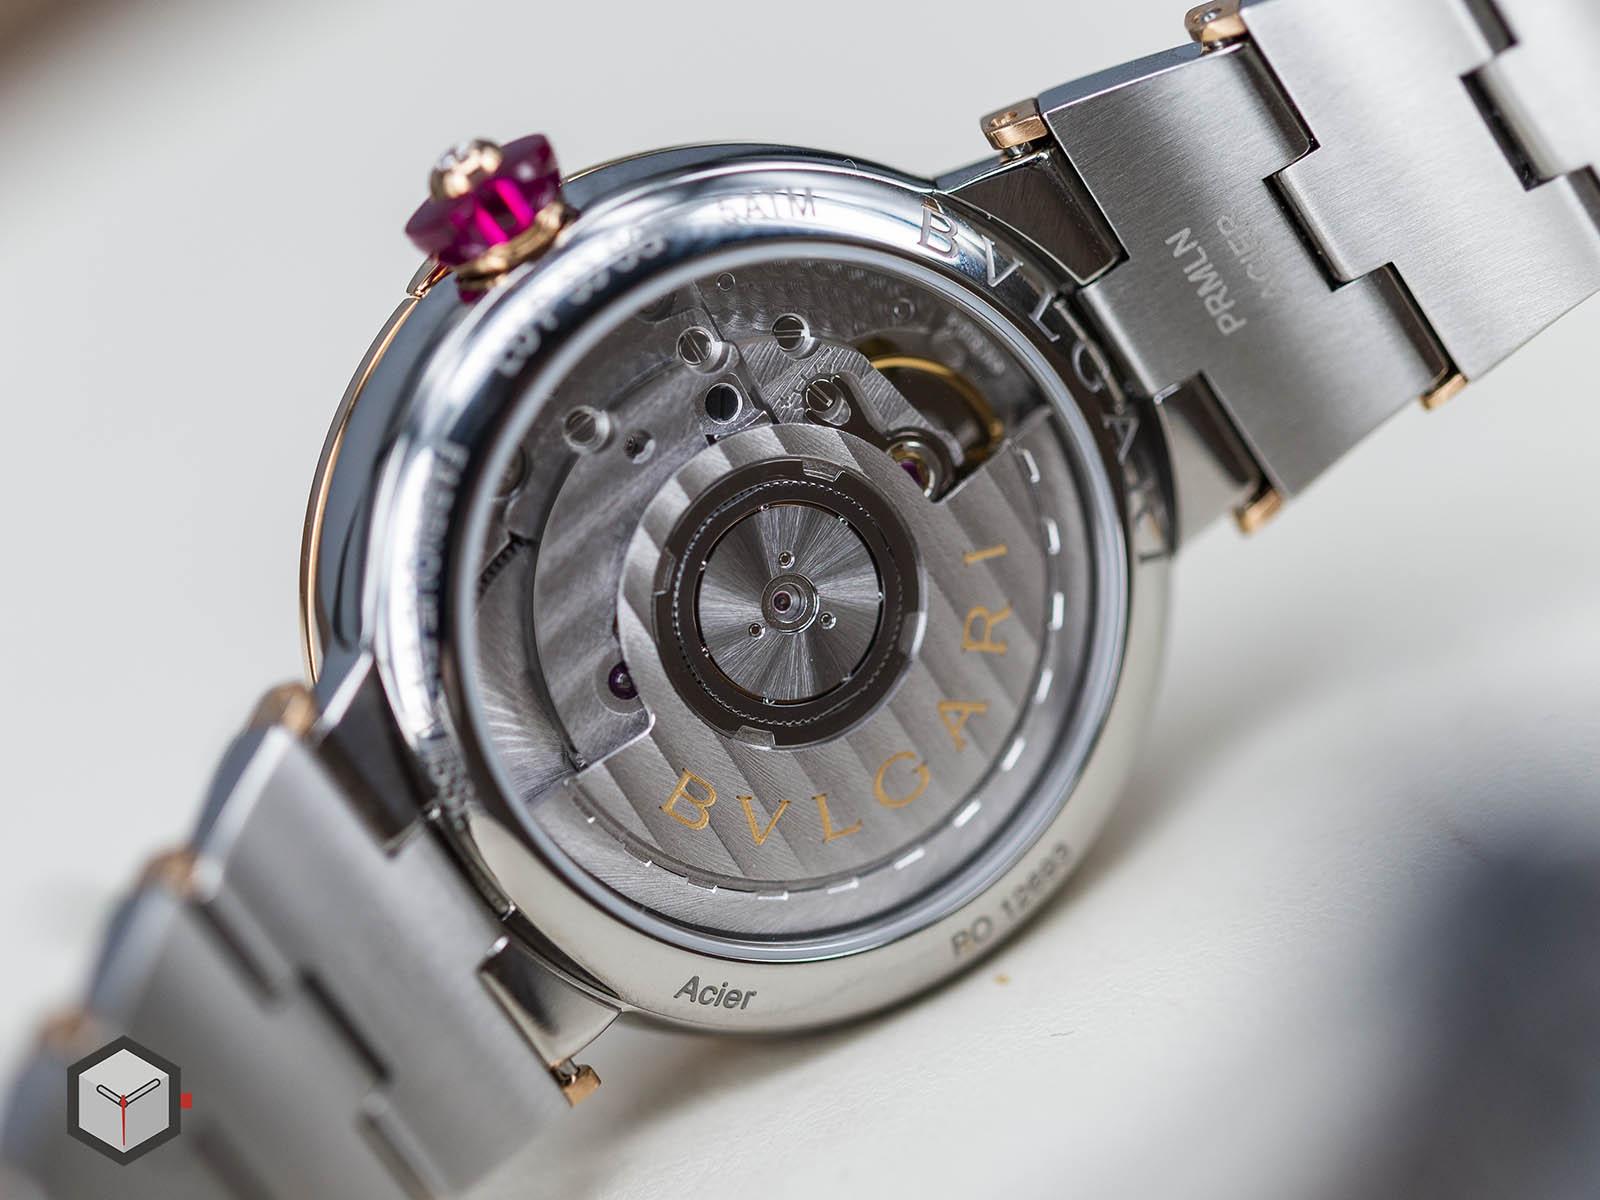 102980-bulgari-lvcea-automatic-stainless-steel-gold-10.jpg